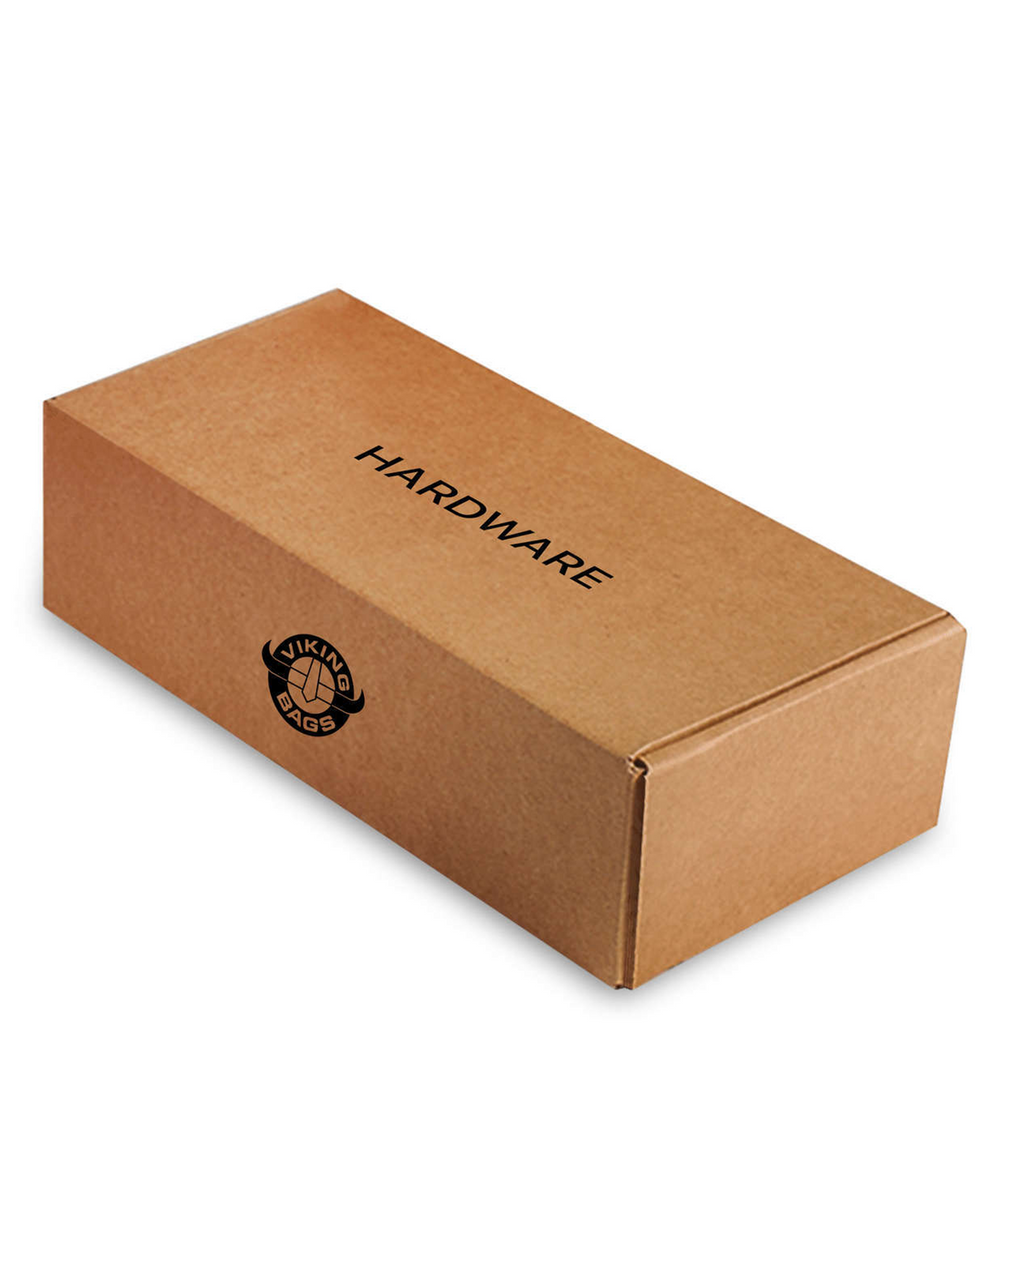 Victory Octane Pinnacle Motorcycle Saddlebags Hardware Box